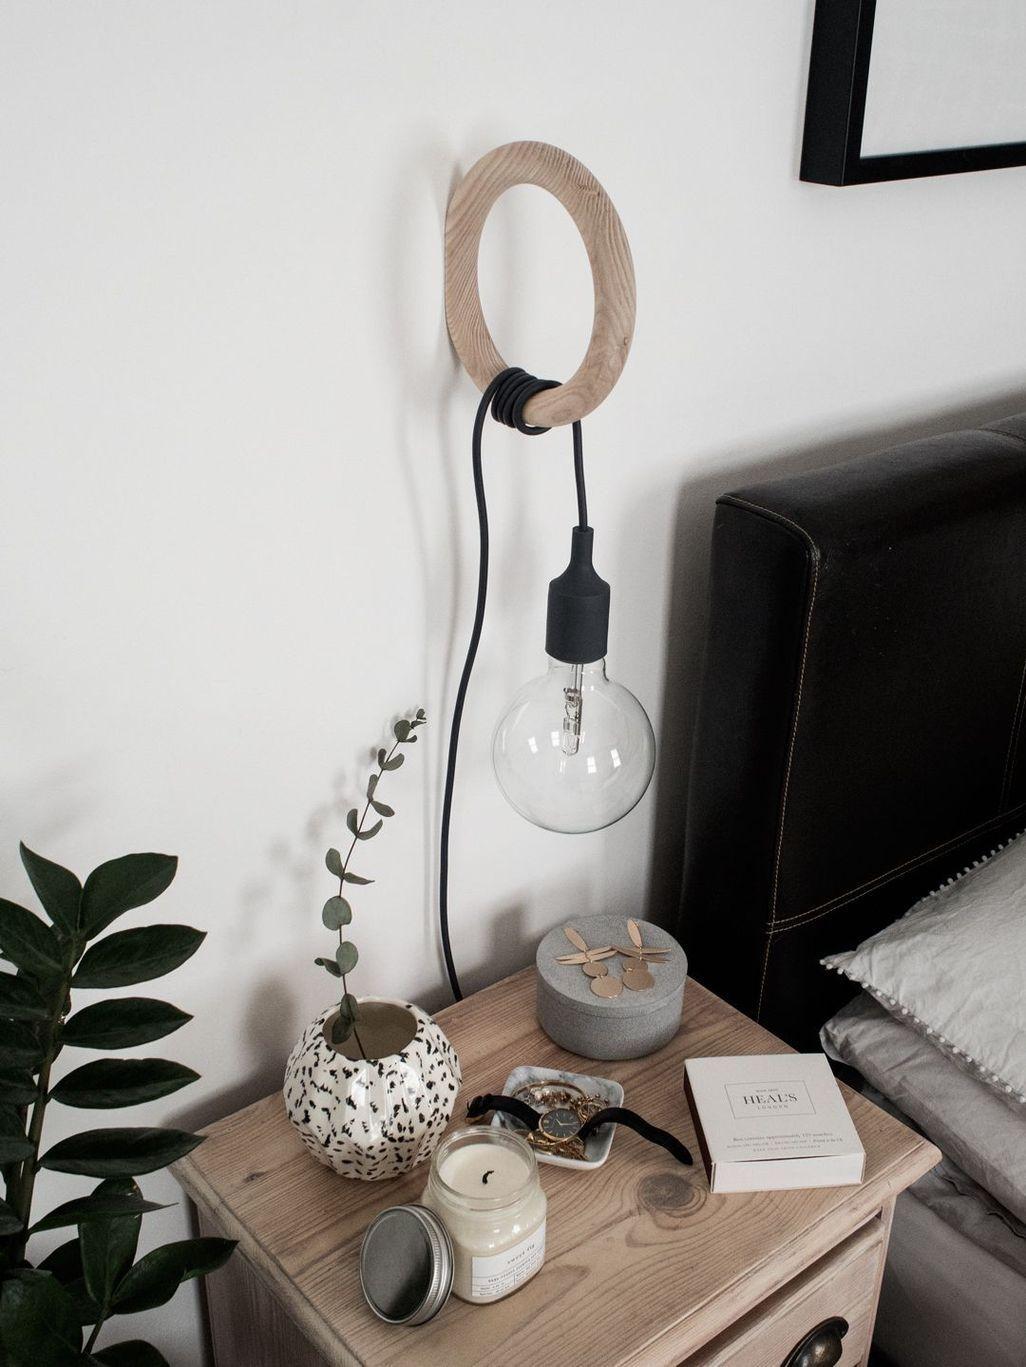 3 Peaceful Cool Tricks Vintage Home Decor Boho Beds Diy Tea CupsVintage Ideas Living Room Beautiful